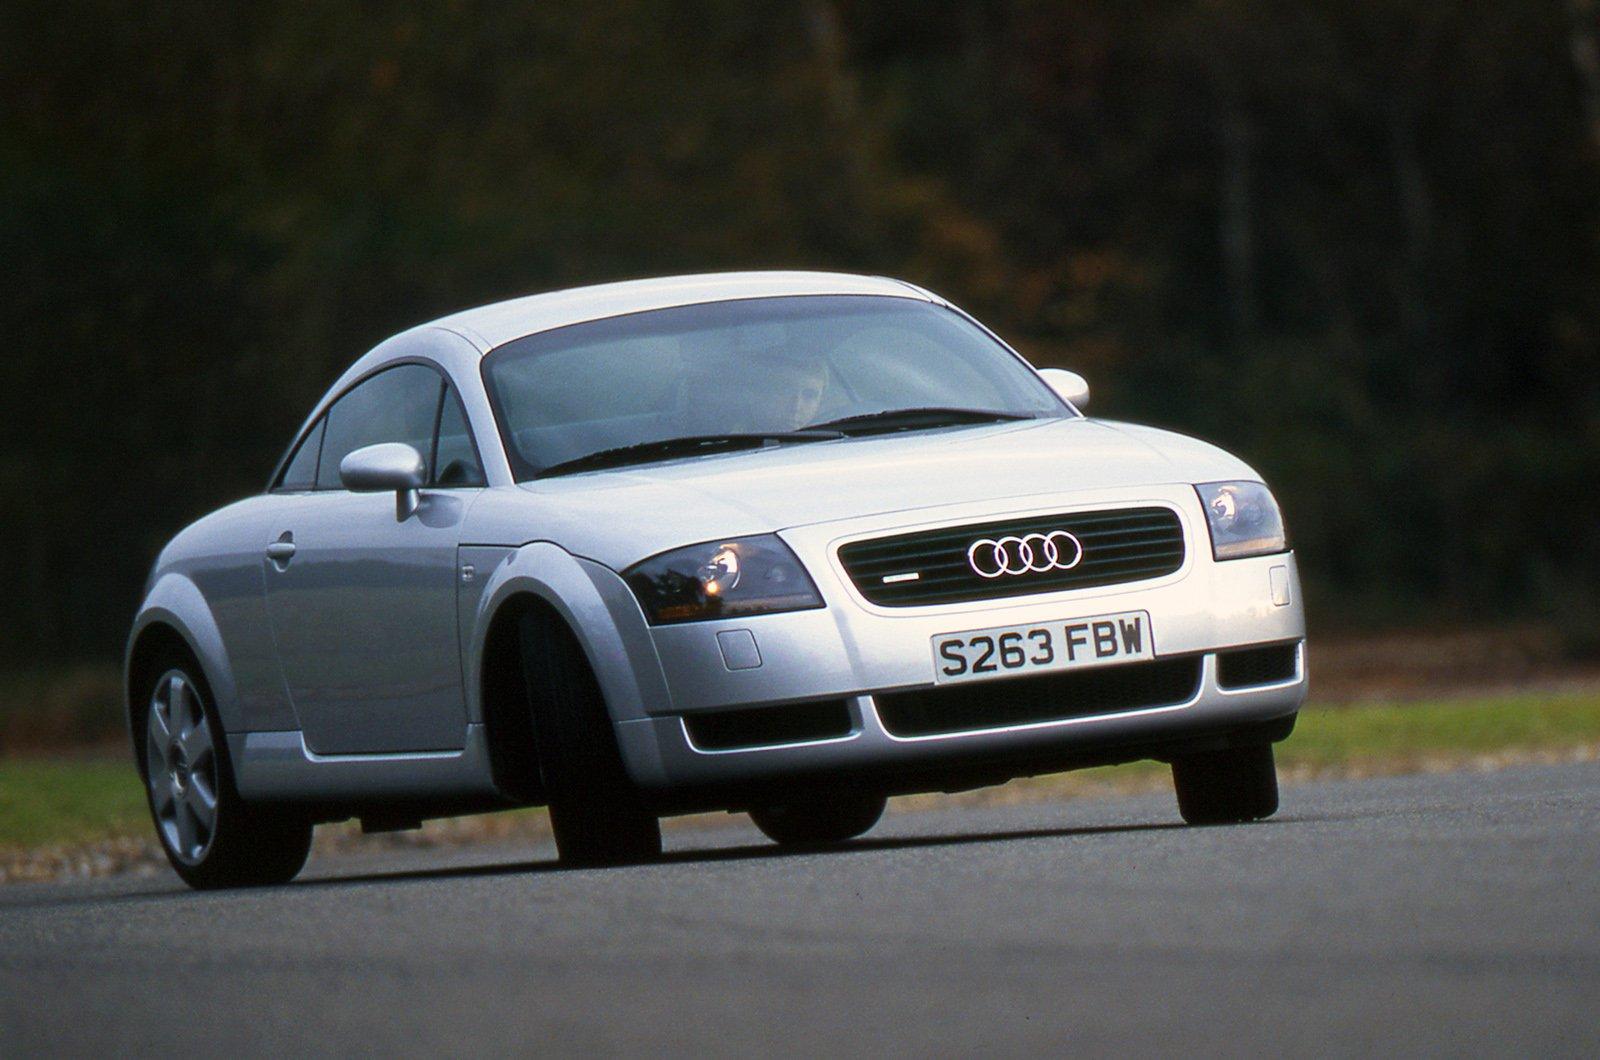 Audi TT AC RT 1998 oversteer